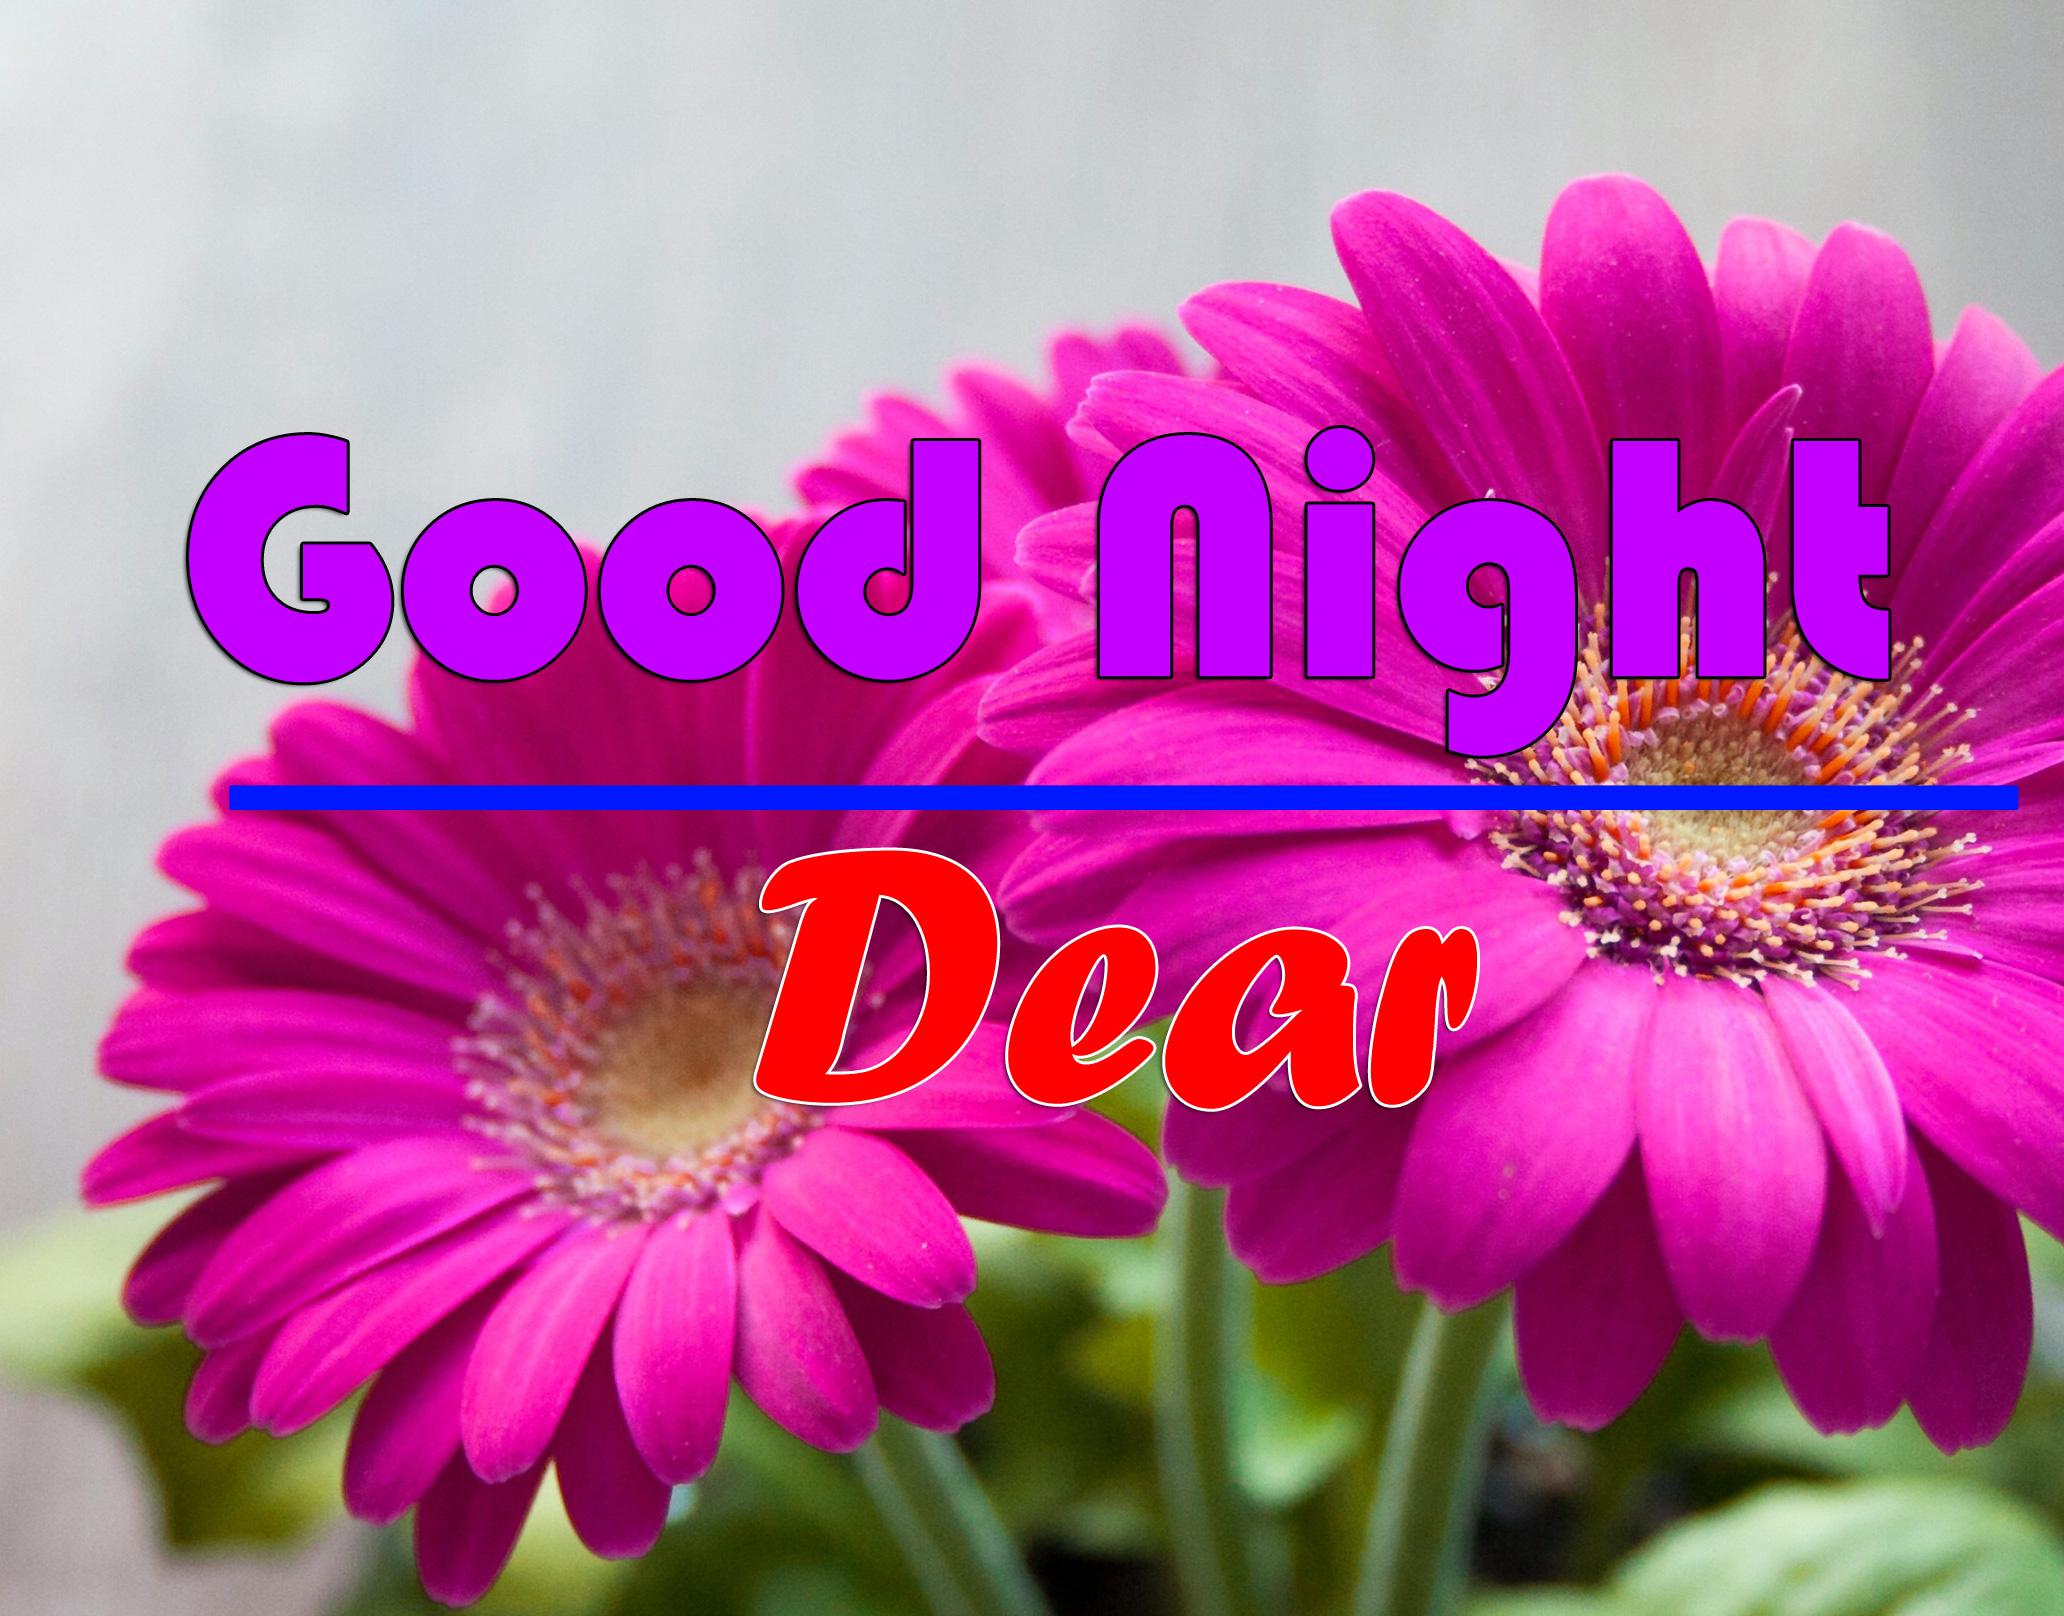 Good Night photo 4 1